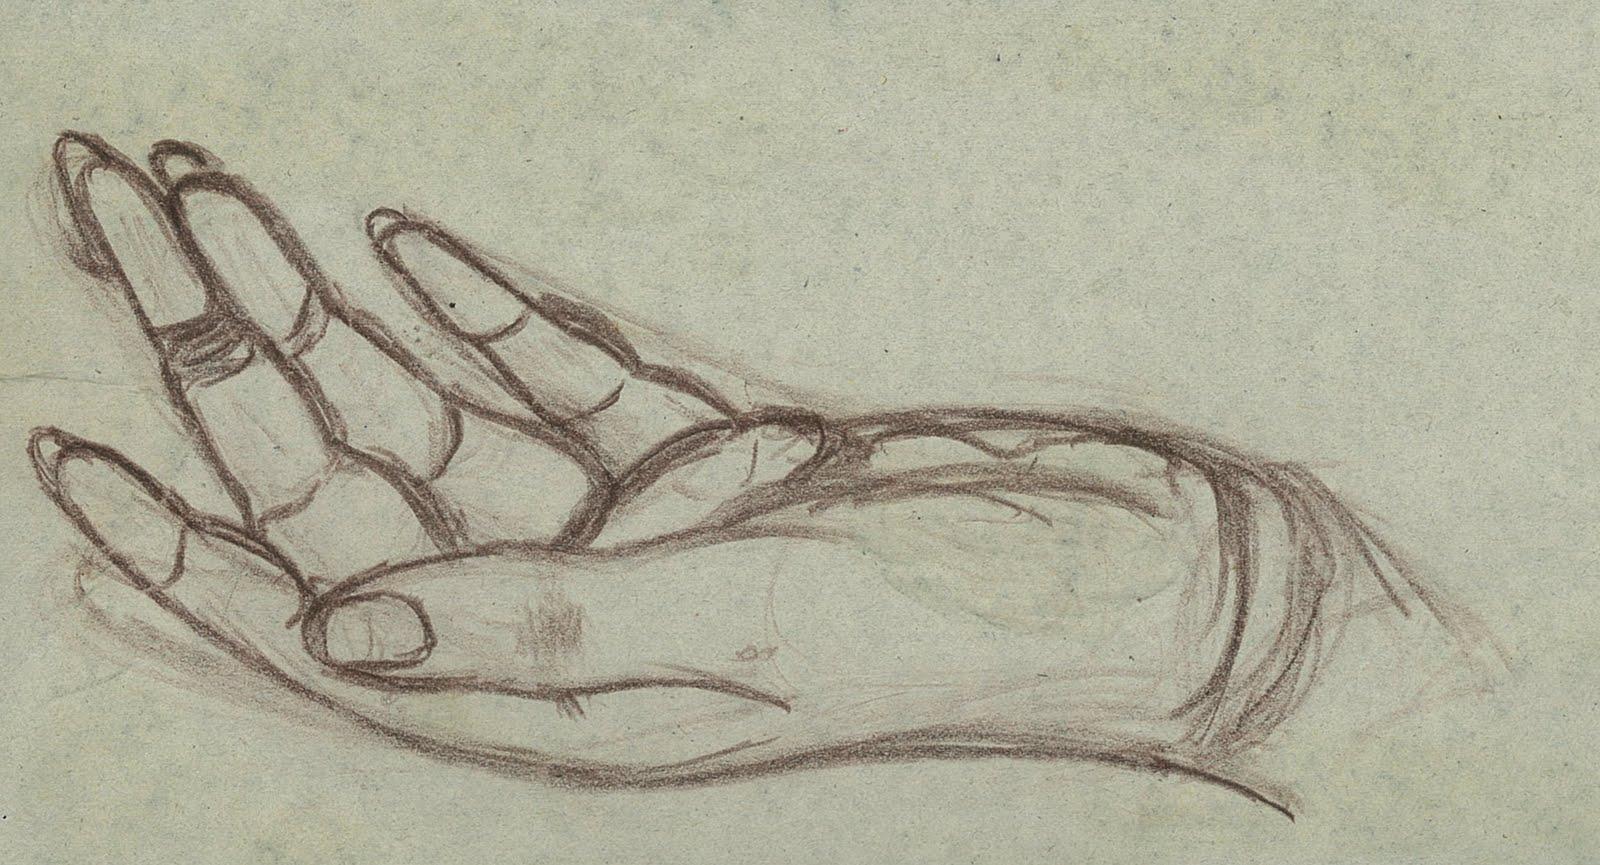 Kris Art Works Hand Line Drawing